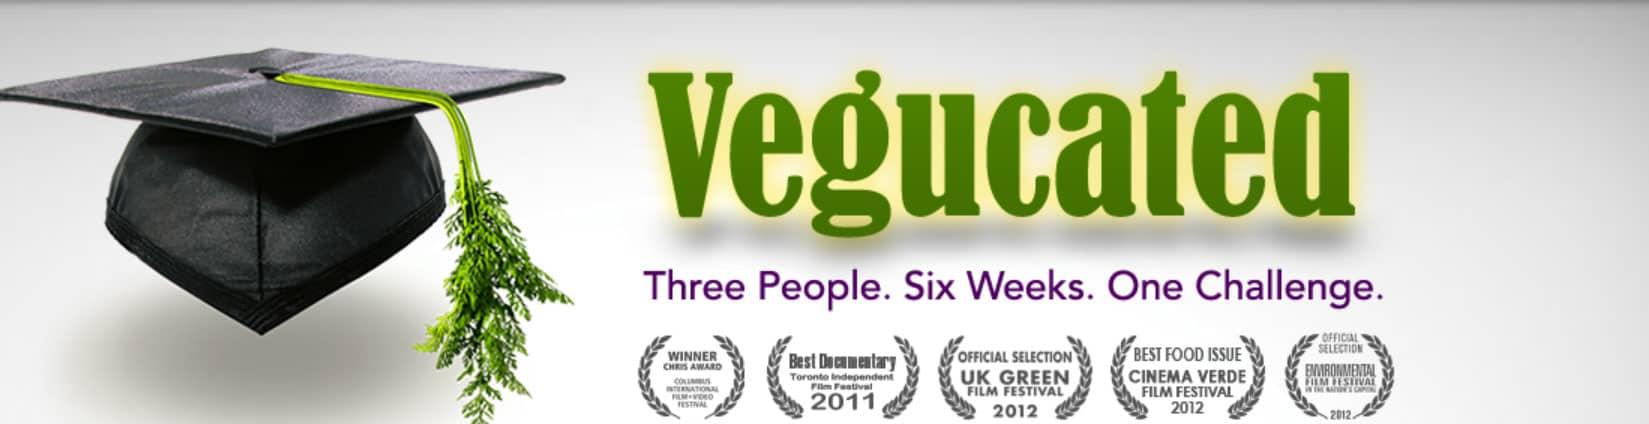 Vegucated - Vegan Paradise